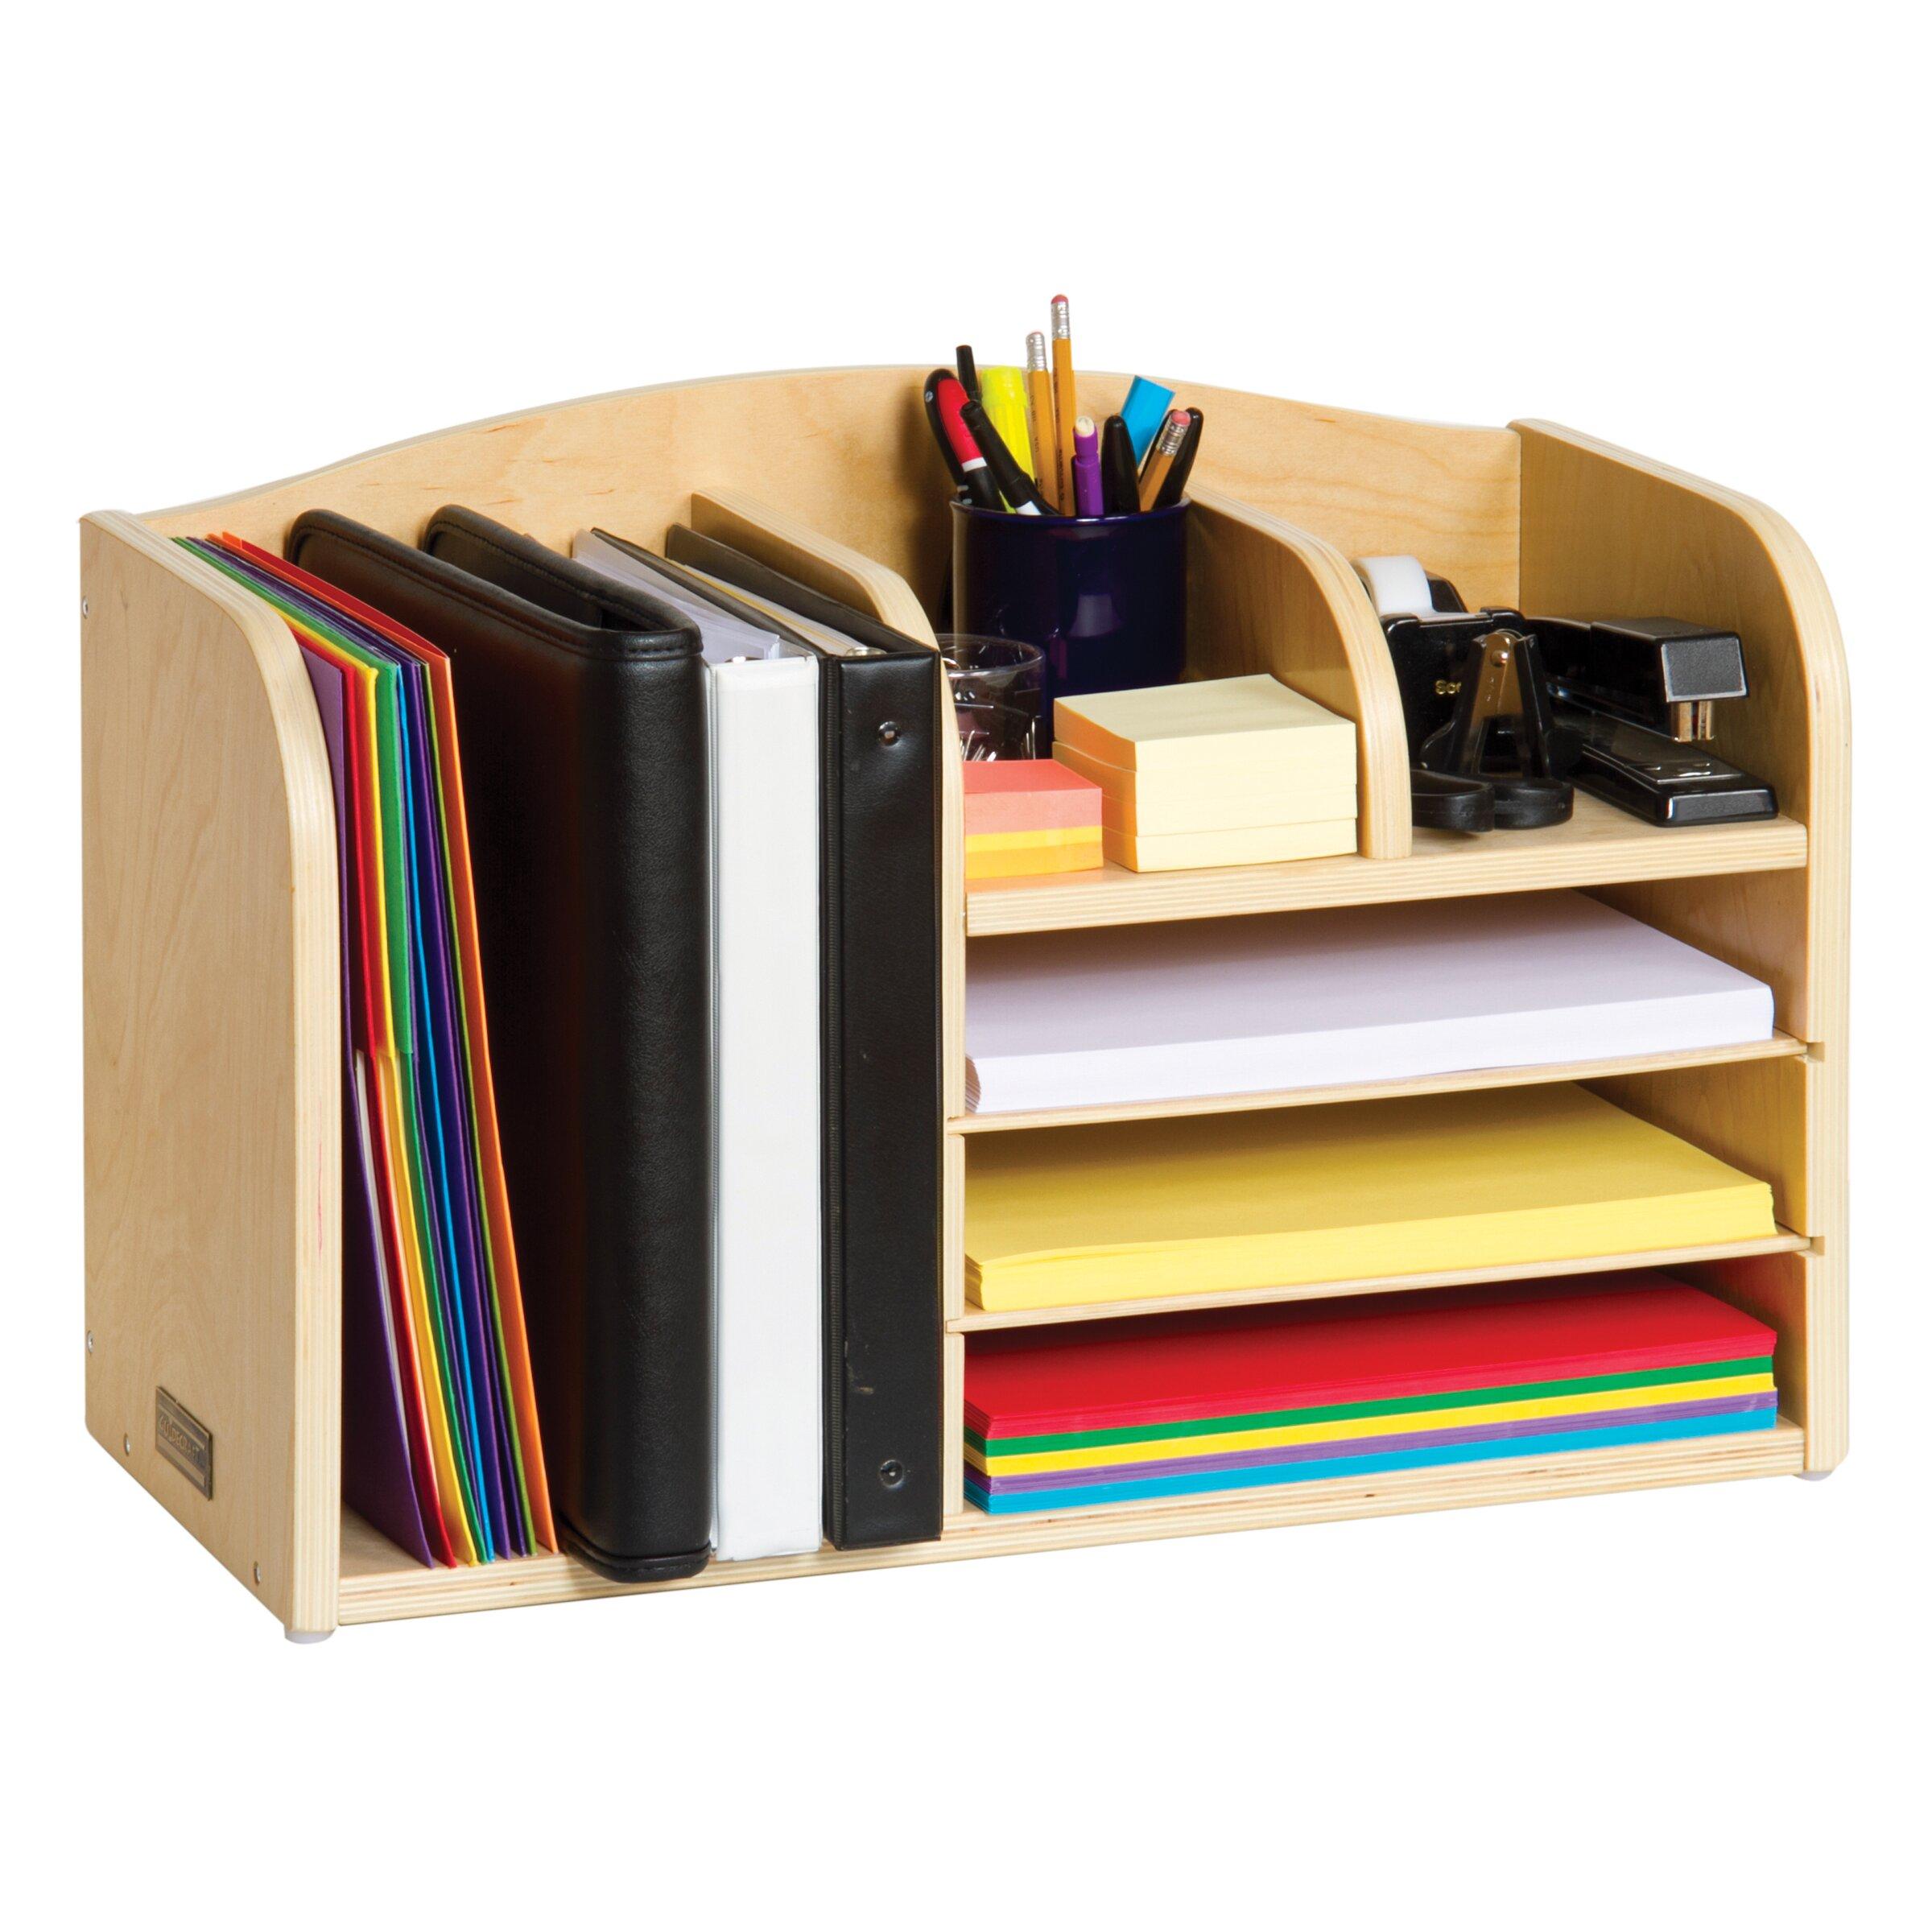 Classroom furniture high desk organizer wayfair - Classroom desk organization ...